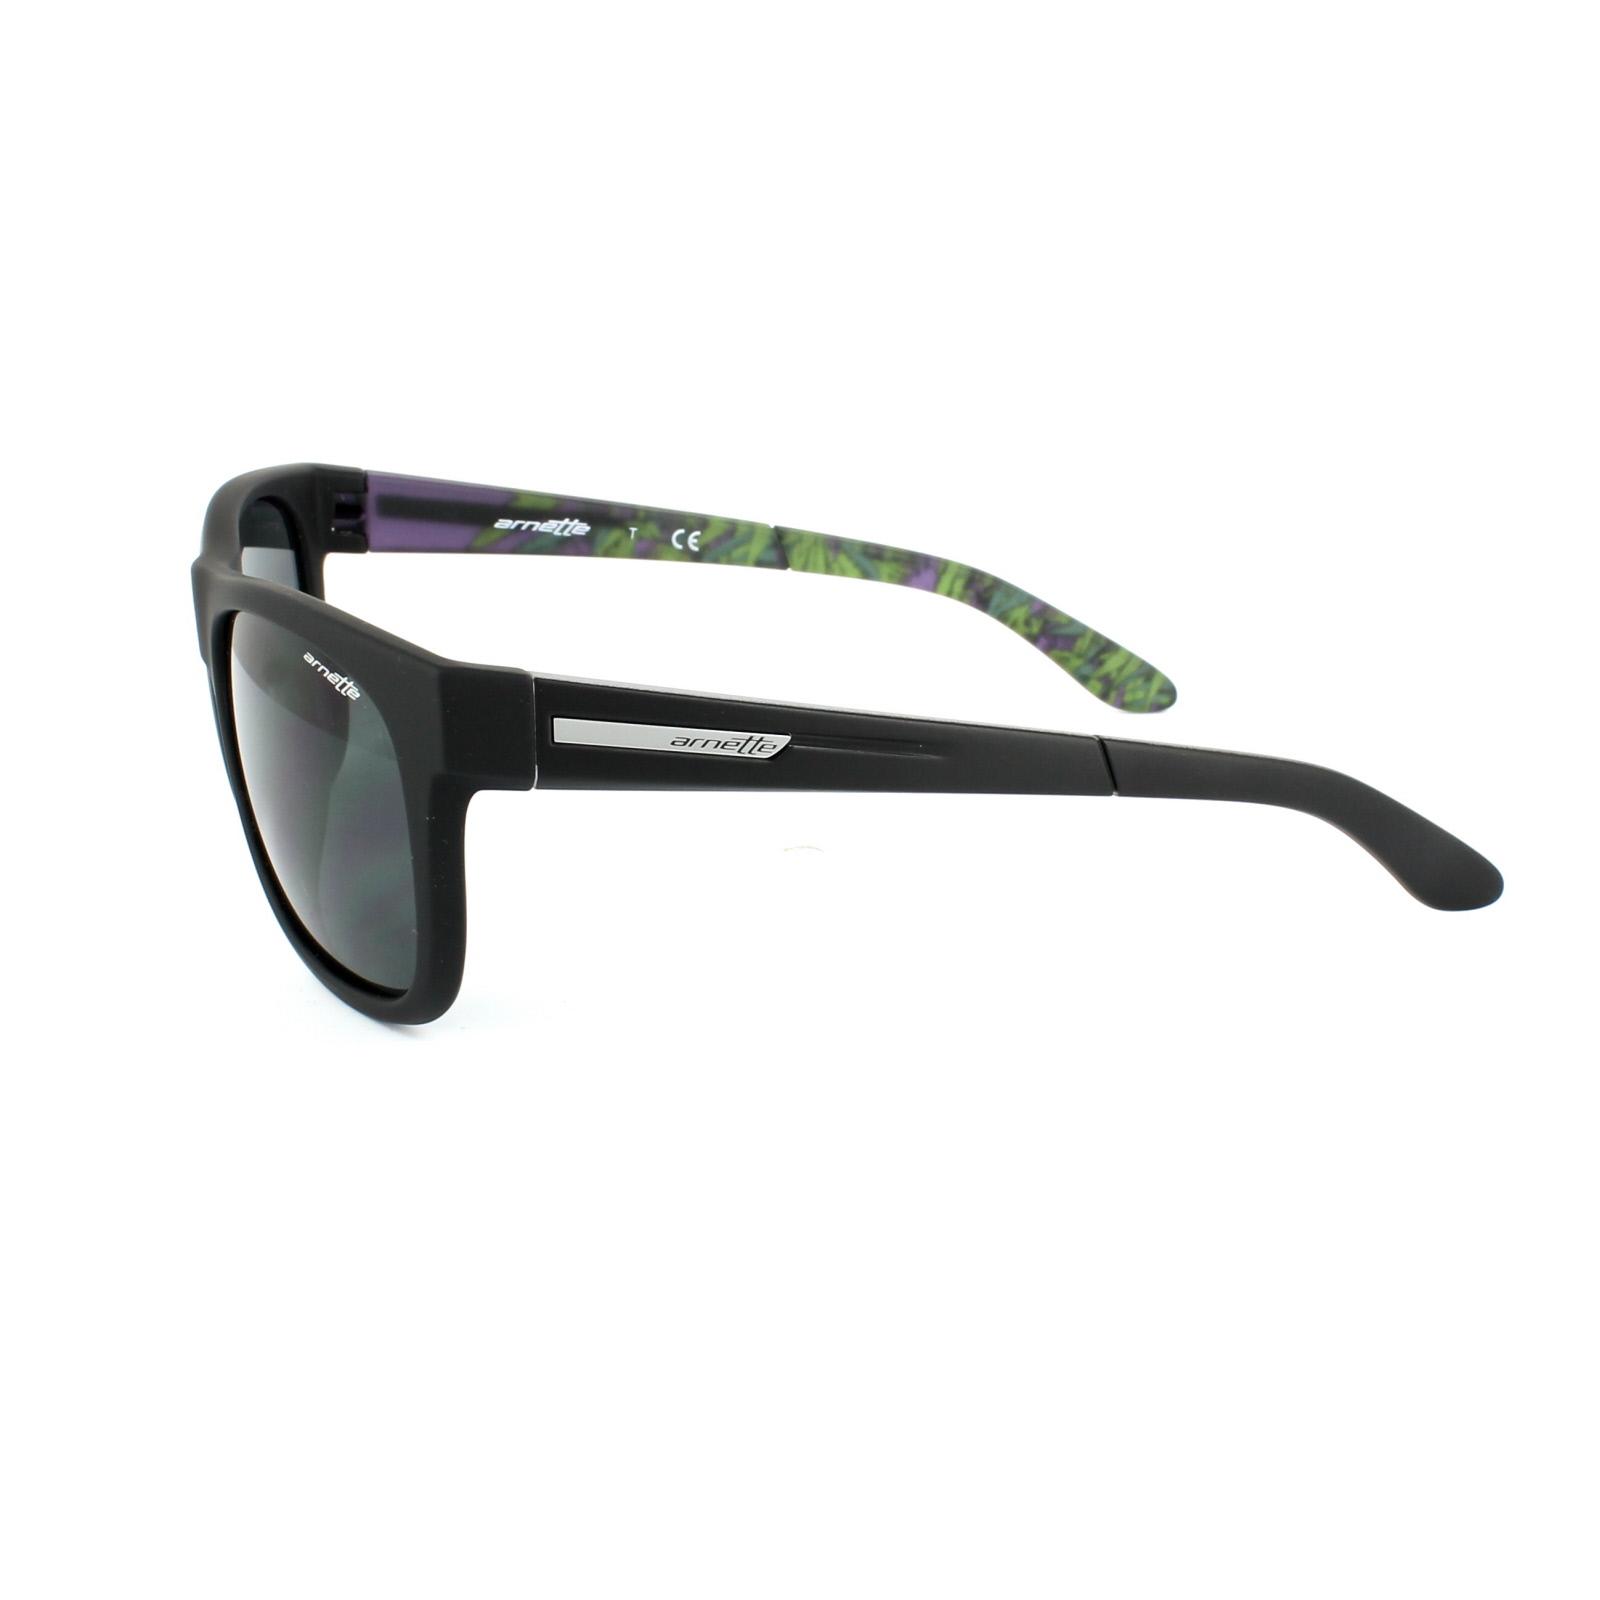 ed1f309dd0 Details about Arnette Sunglasses 4206 Fire Drill Lite 228687 Fuzzy Black  Grey